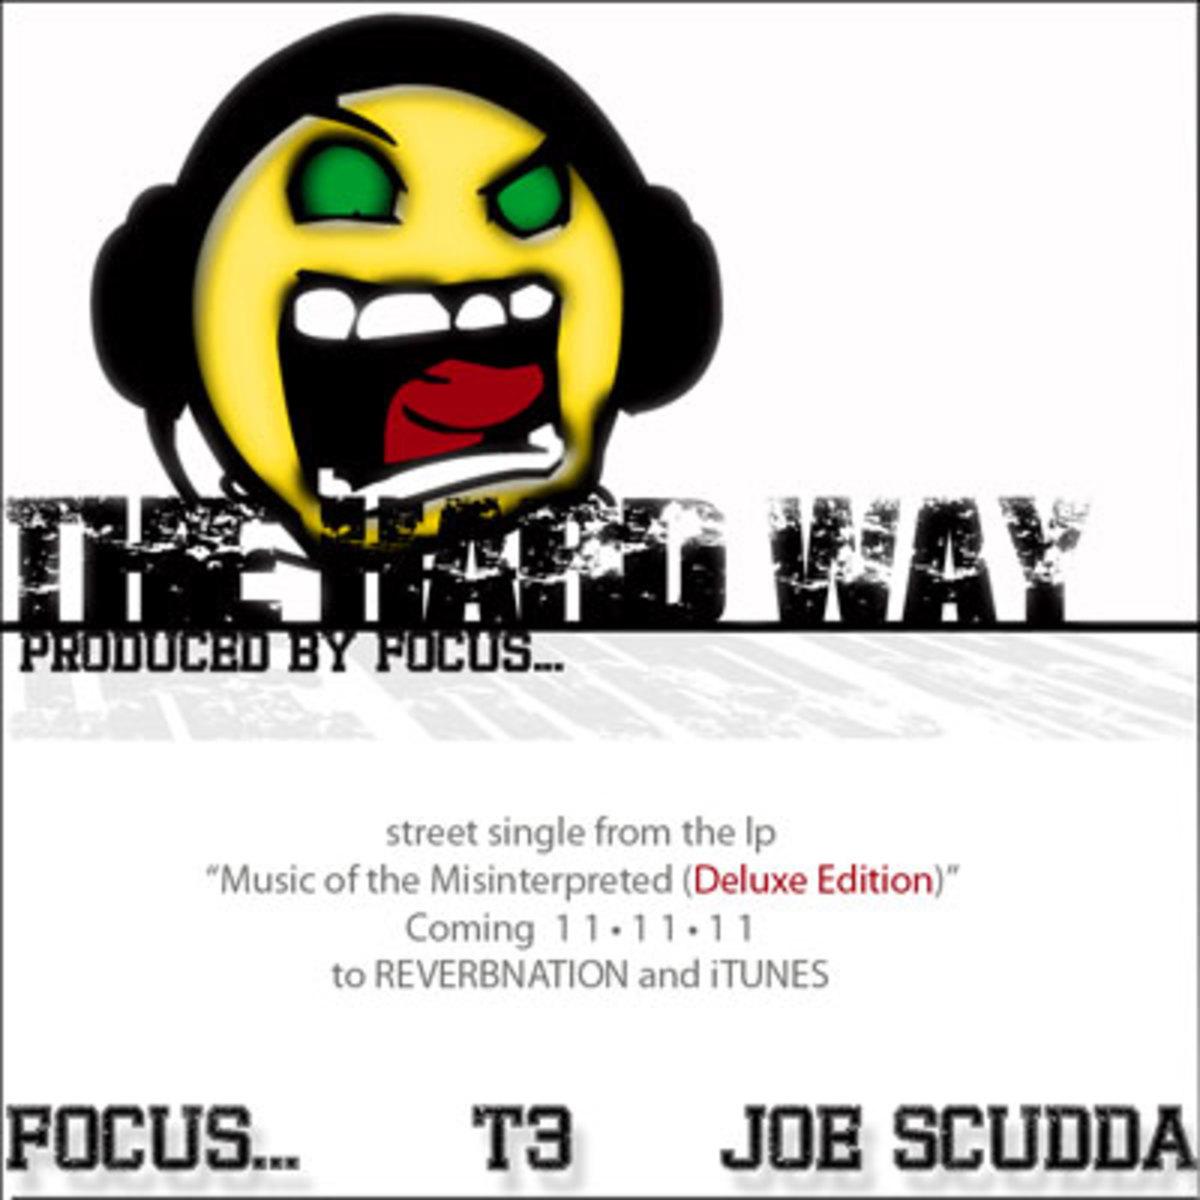 focus-thehardway.jpg